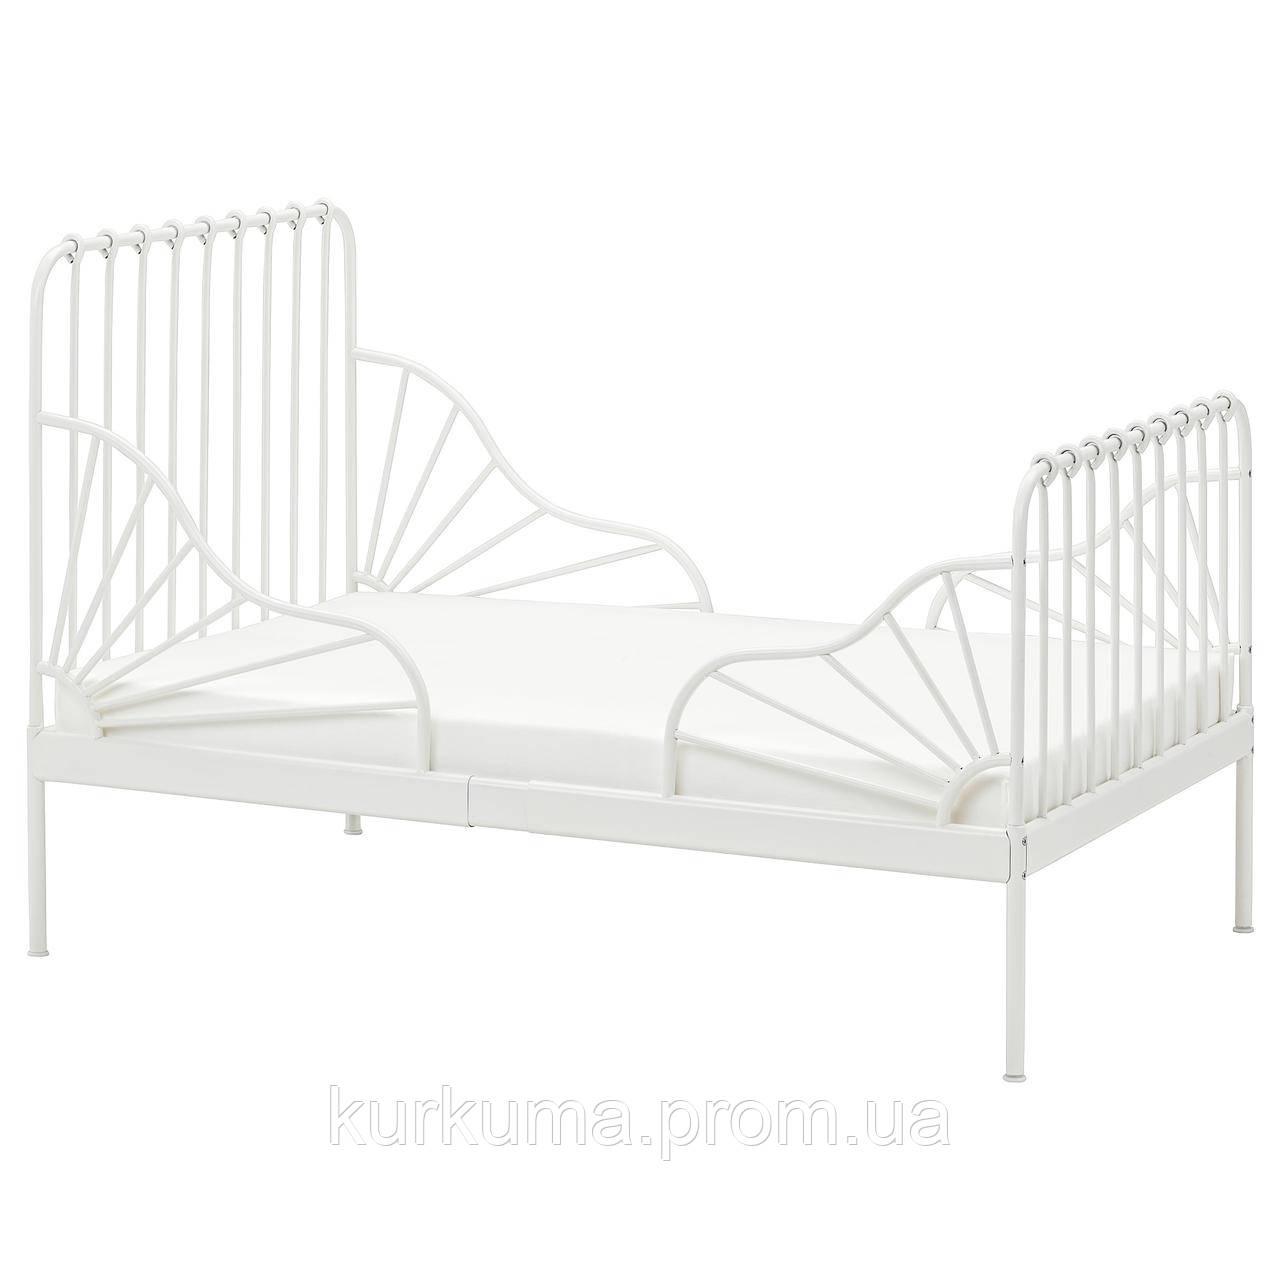 IKEA MINNEN Каркас раздвижной кровати, белый  (291.239.58)